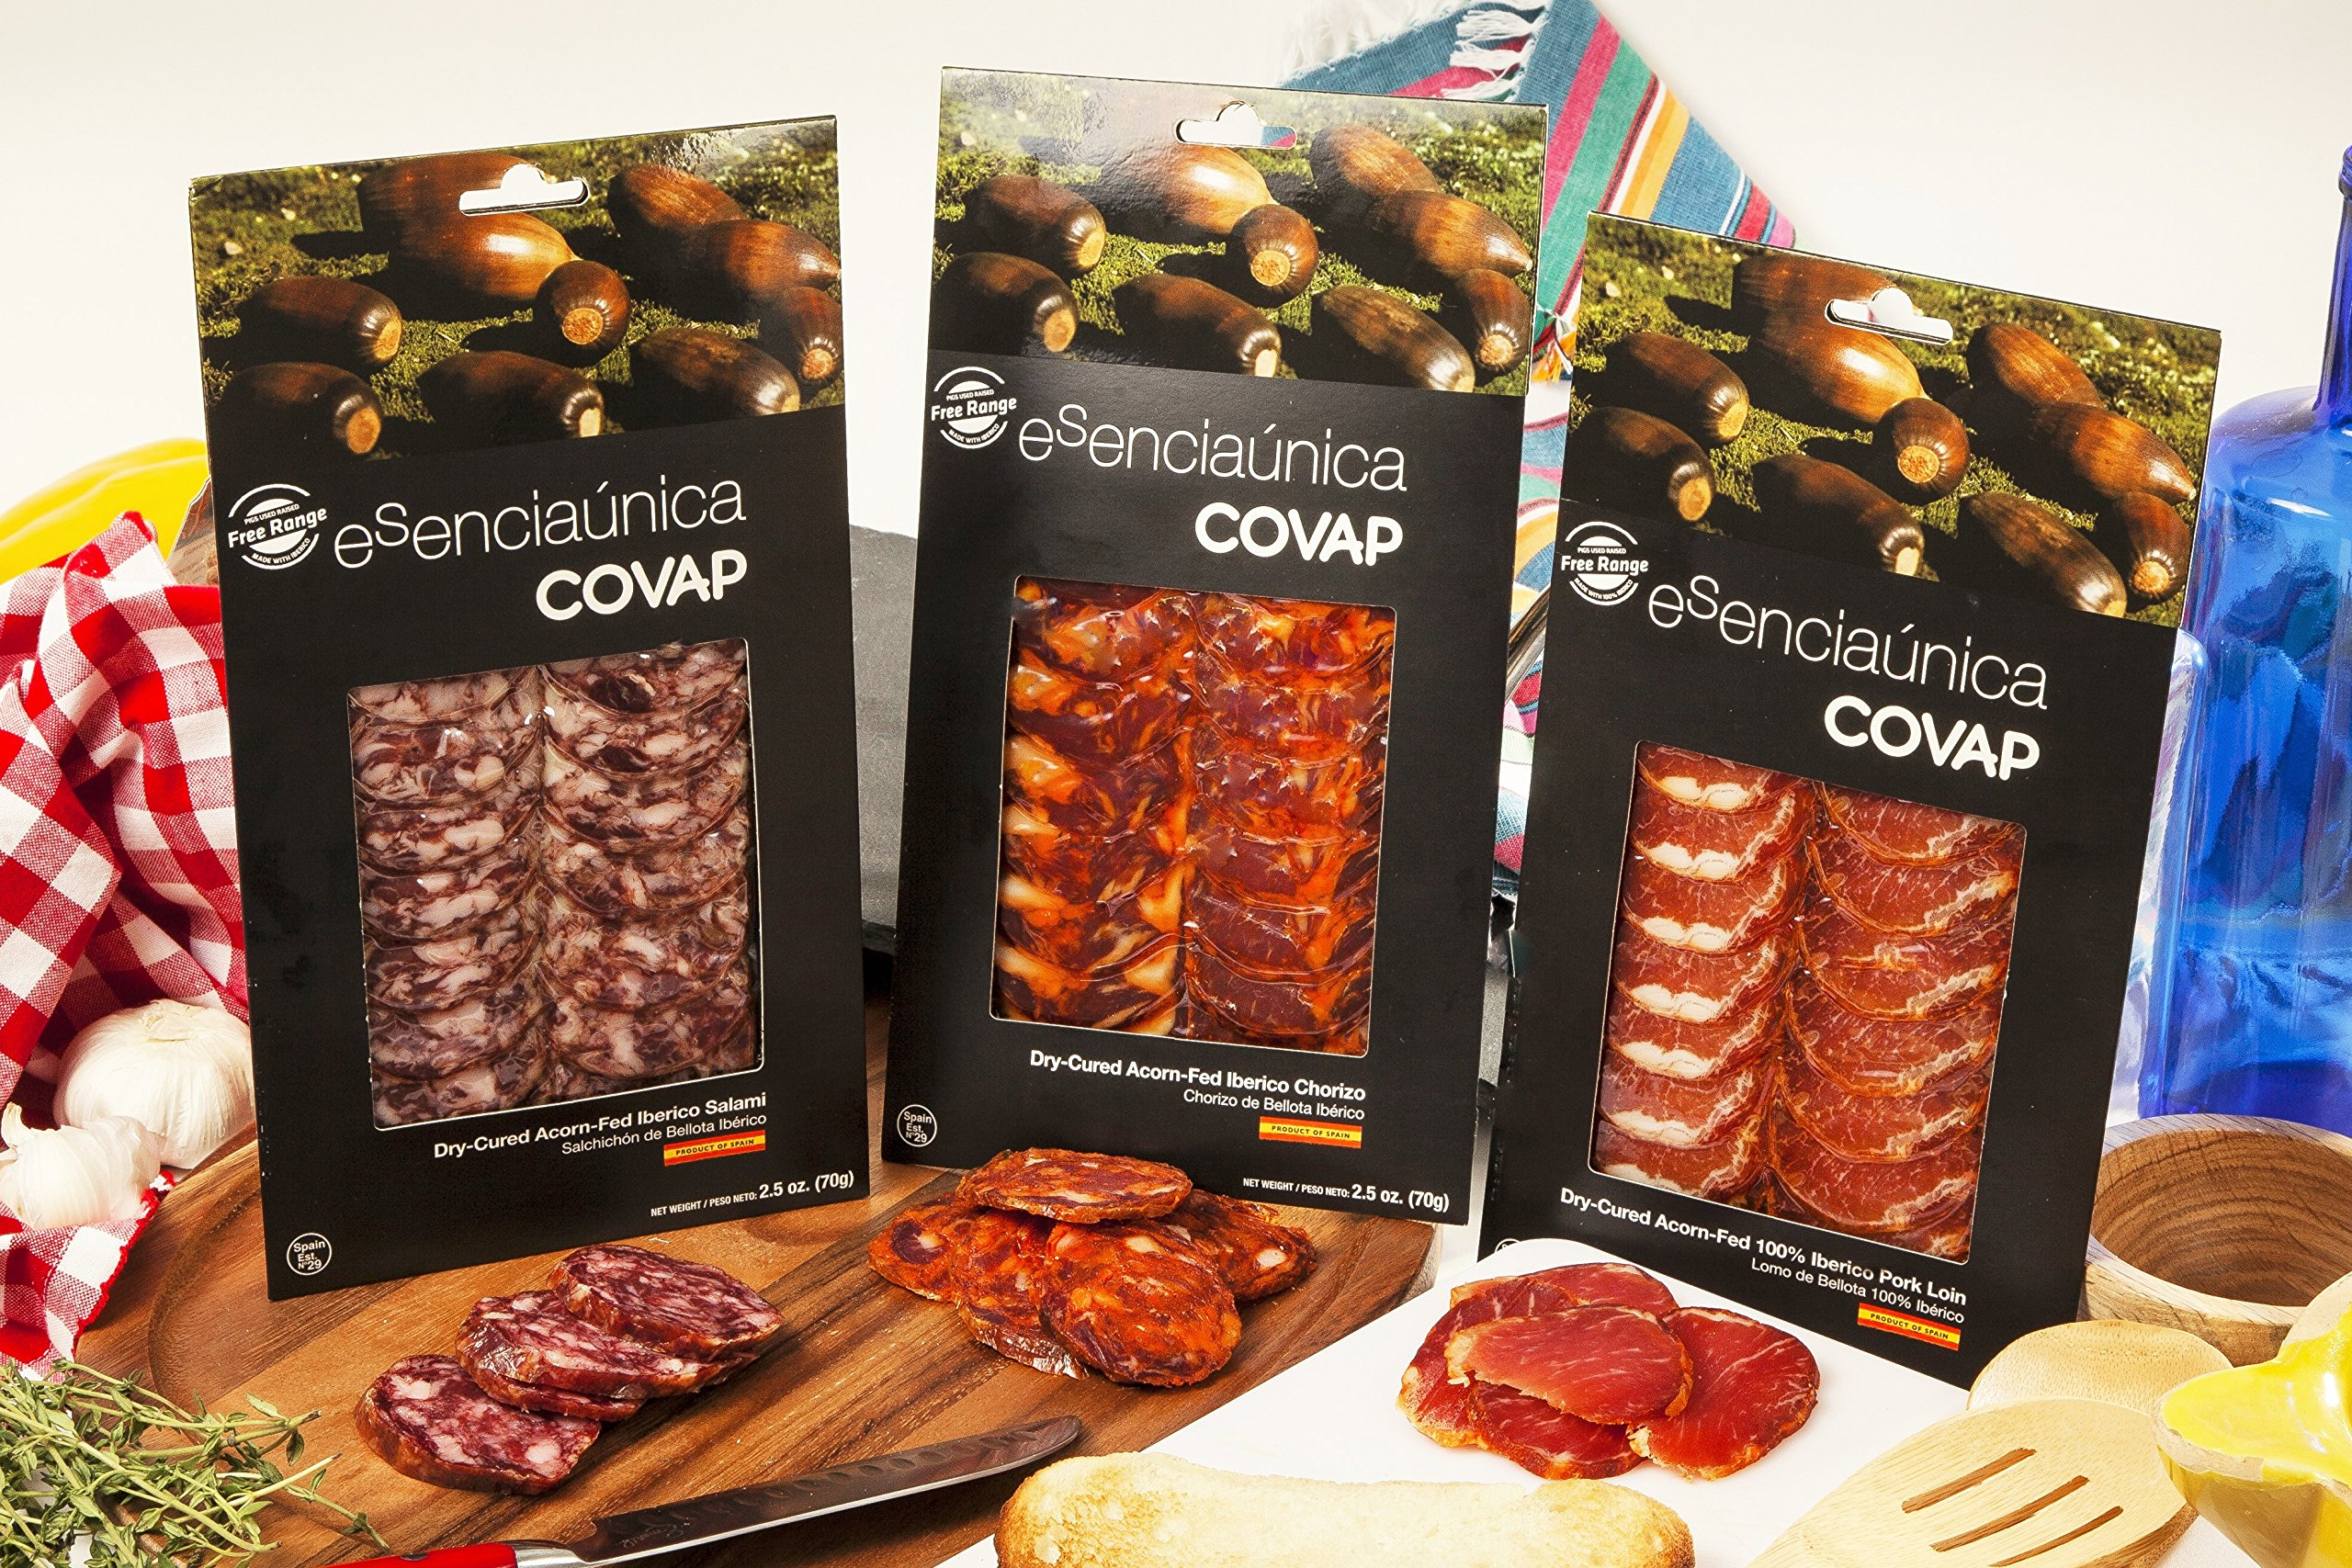 Acorn Fed Trio Loin, Chorizo and Salami Sliced (7.5 oz)